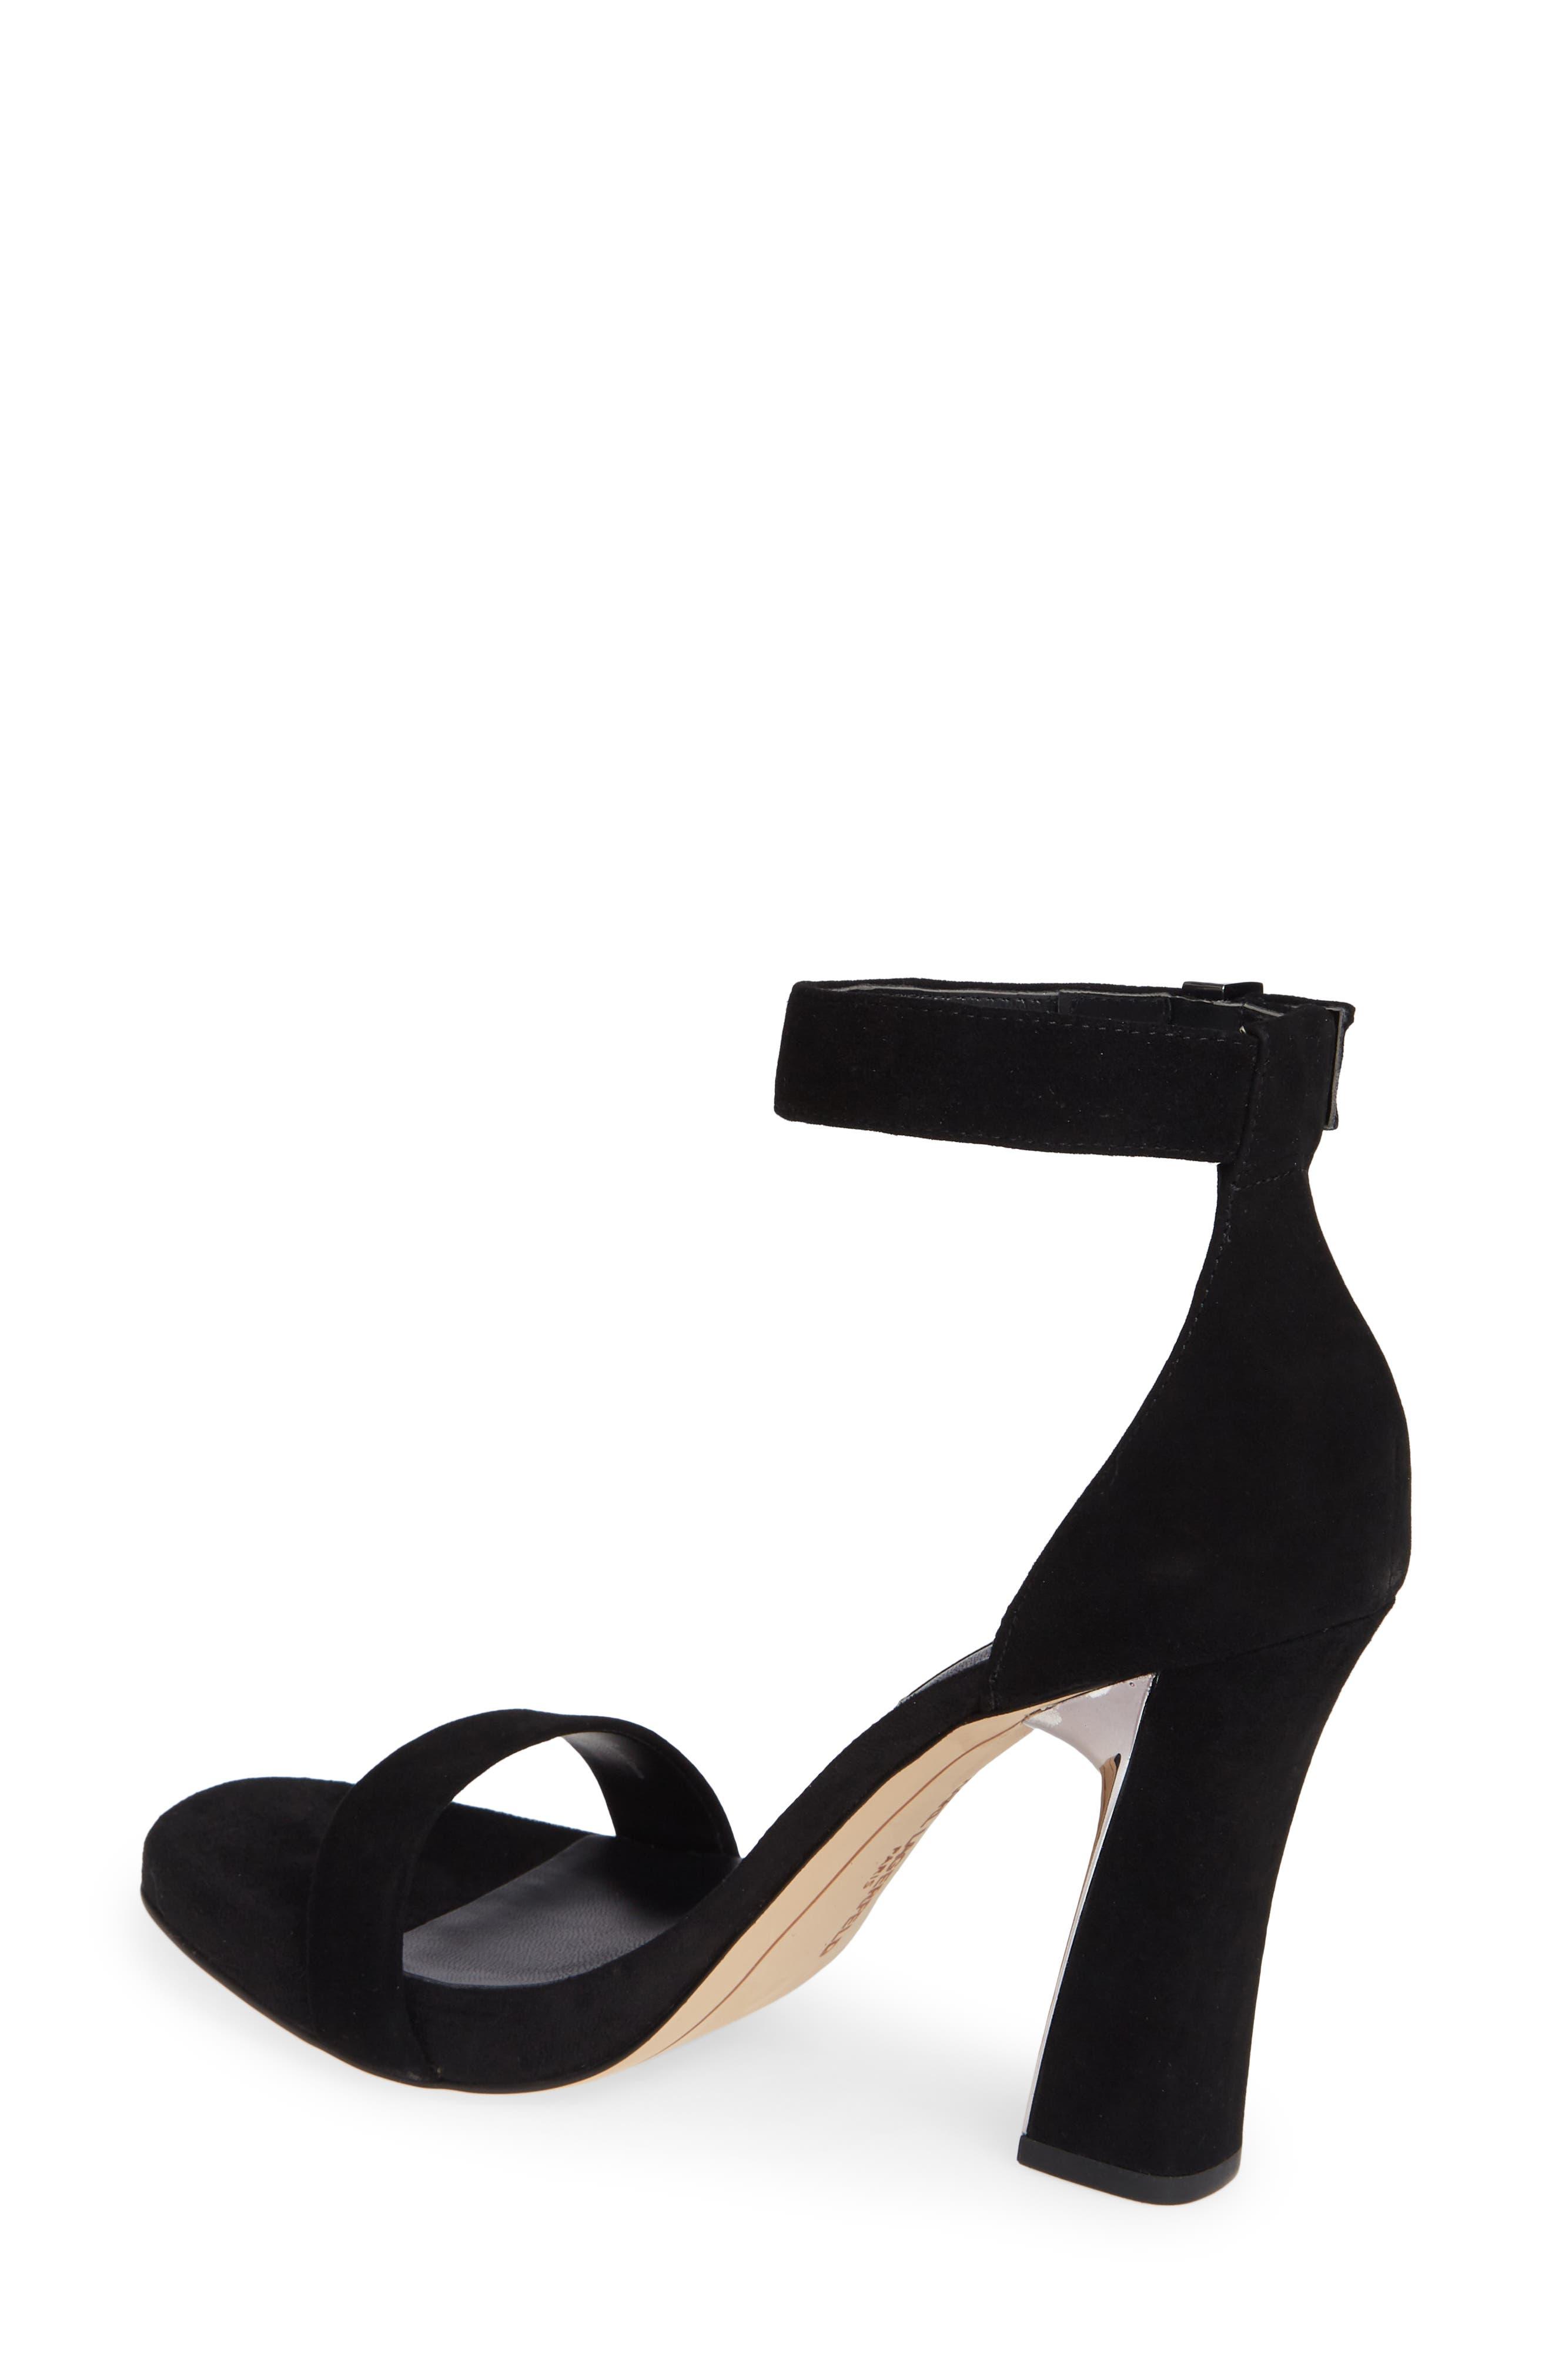 KARL LAGERFELD PARIS, Carah Ankle Strap Sandal, Alternate thumbnail 2, color, BLACK SUEDE